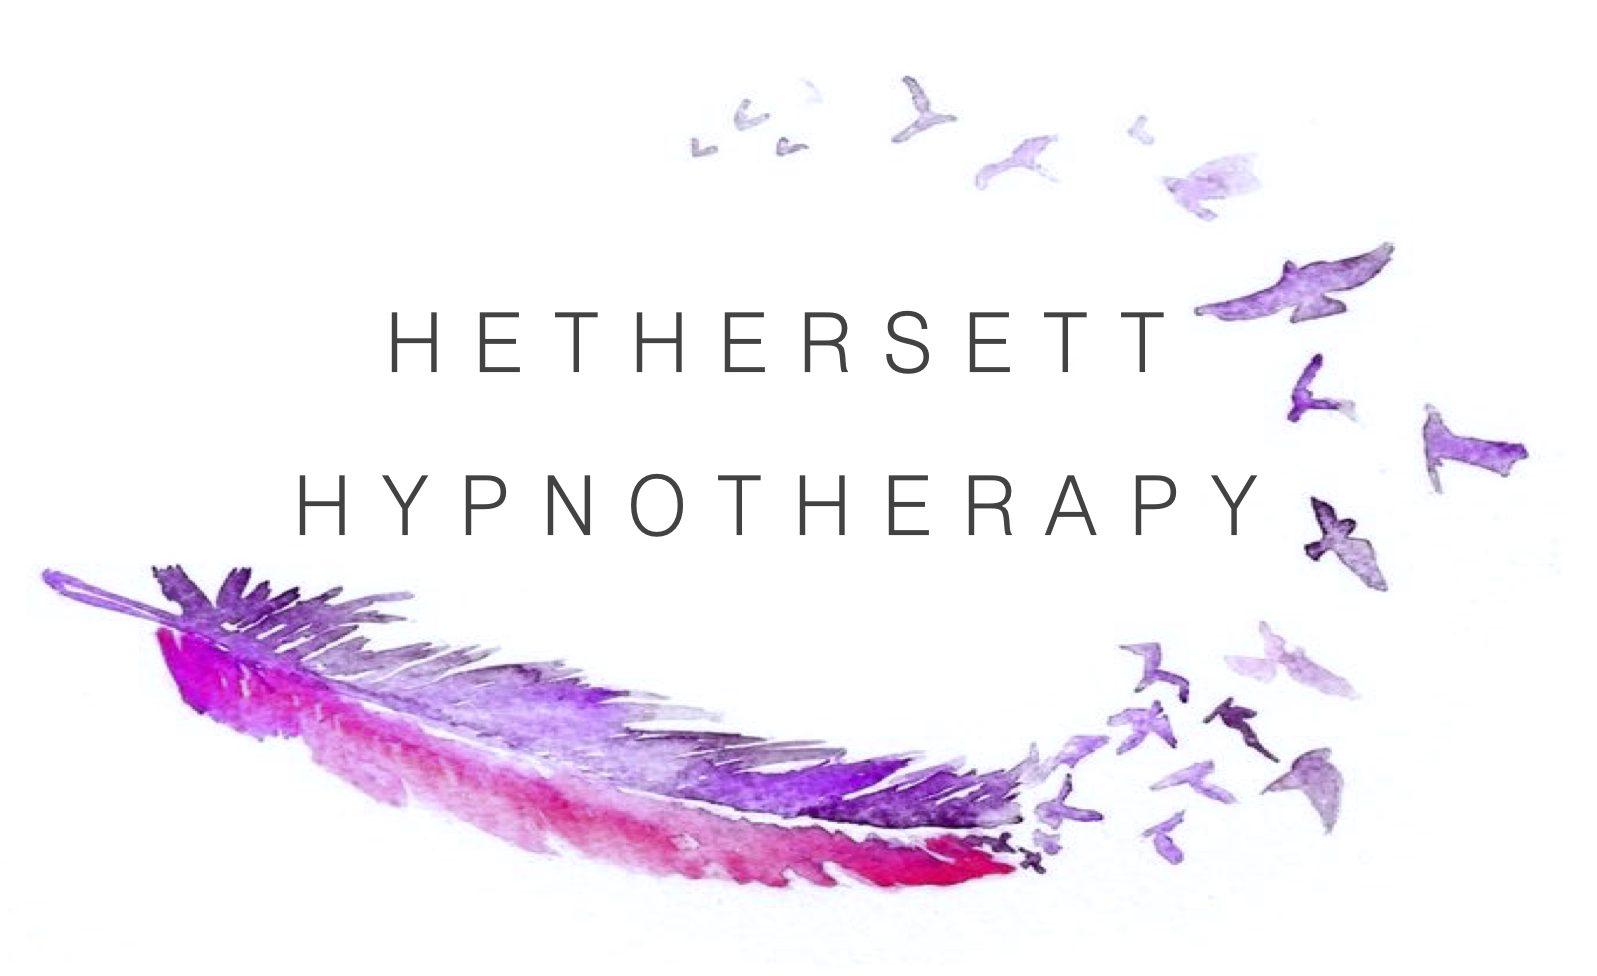 Hethersett hypnotherapy